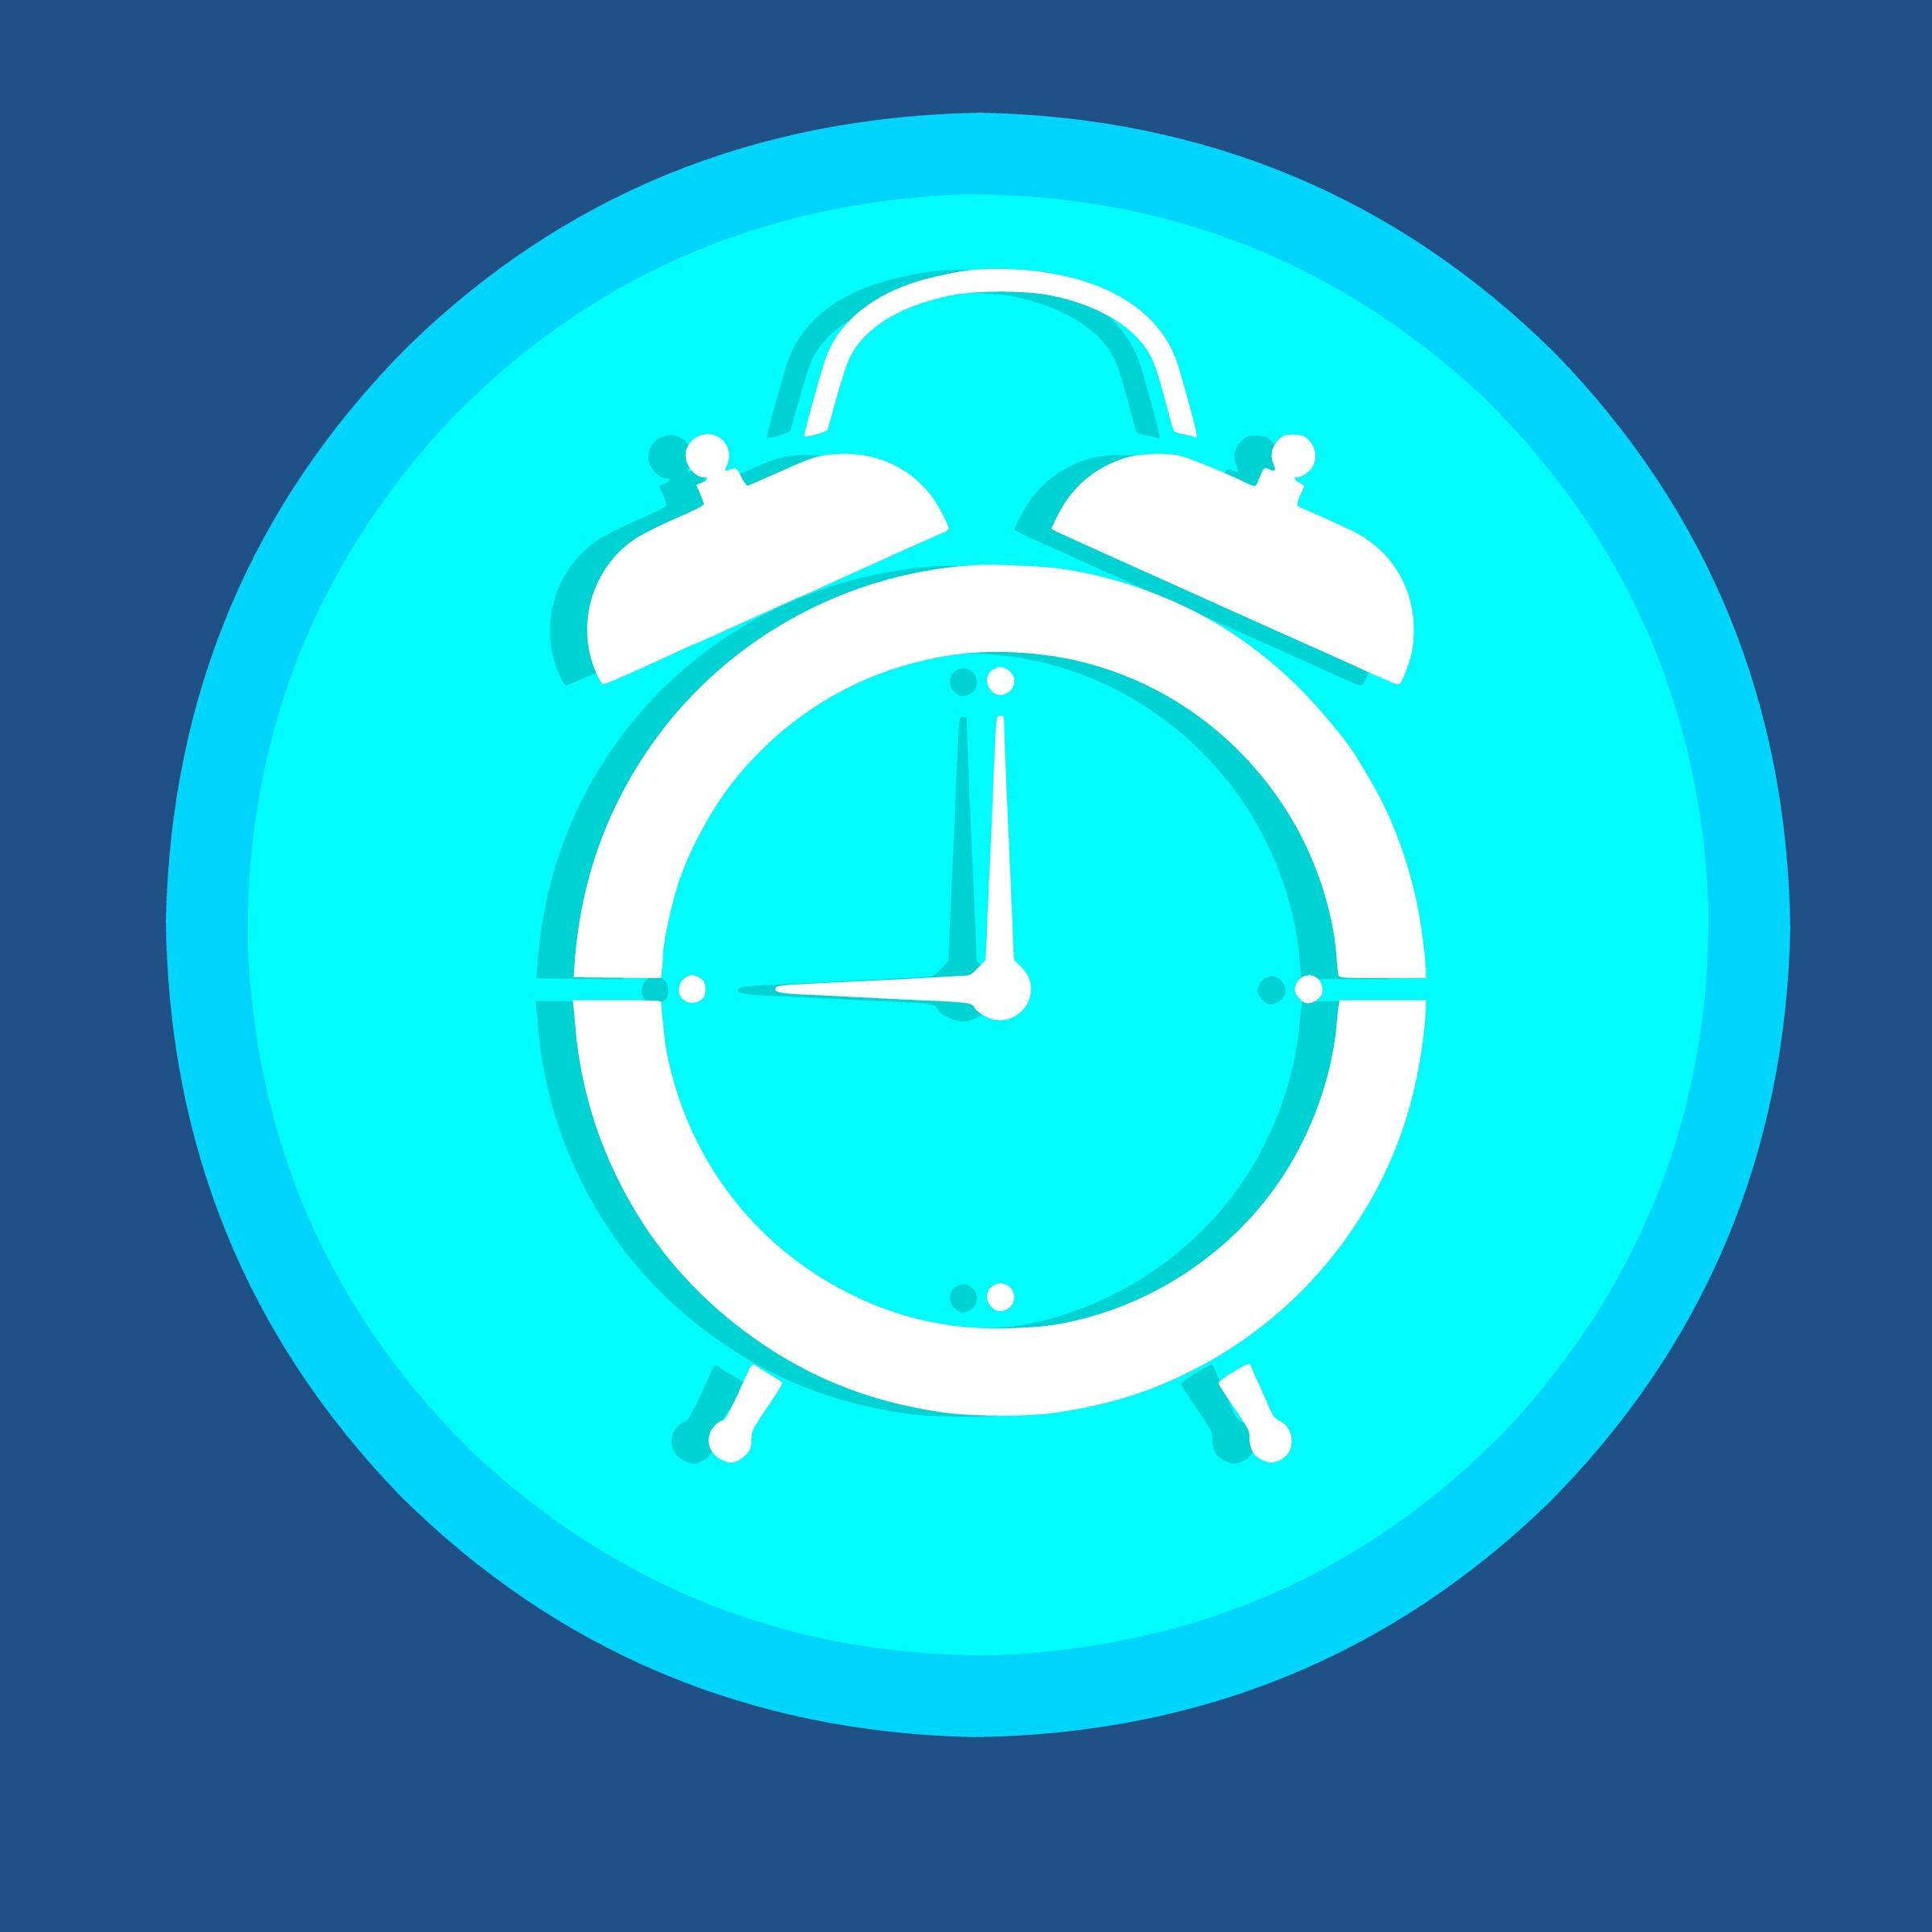 Gambar Logo Waktu